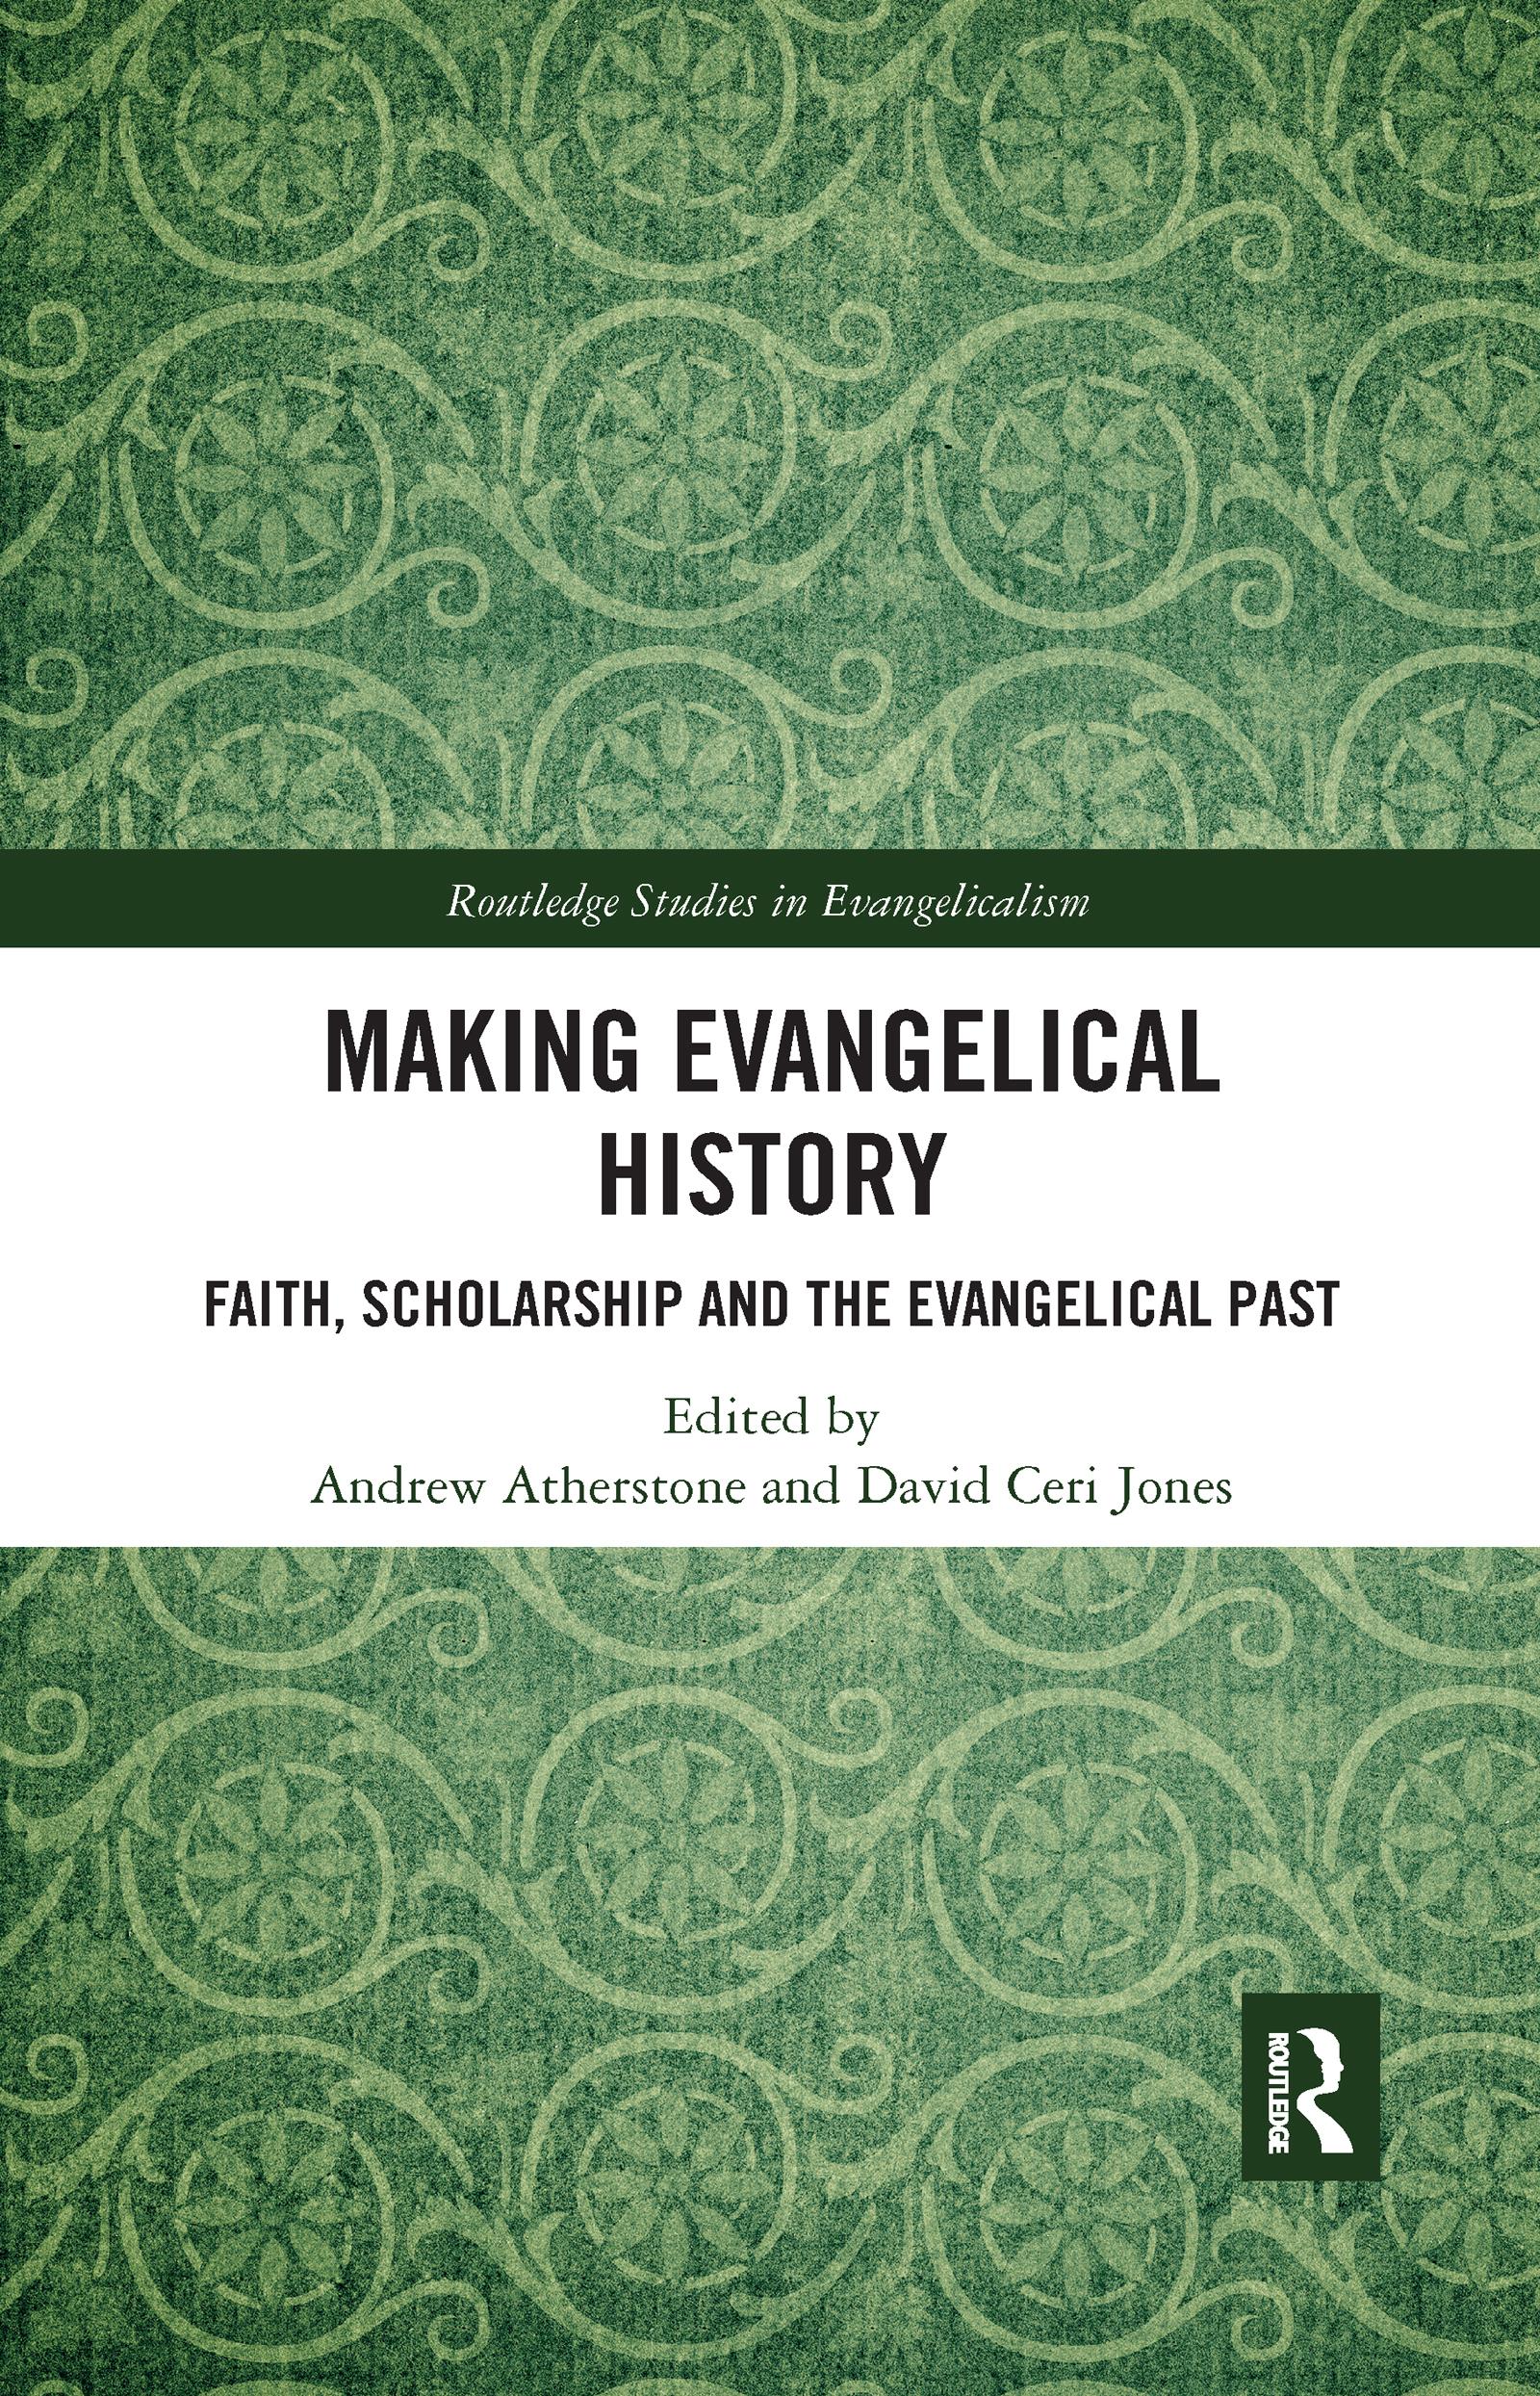 Making Evangelical History